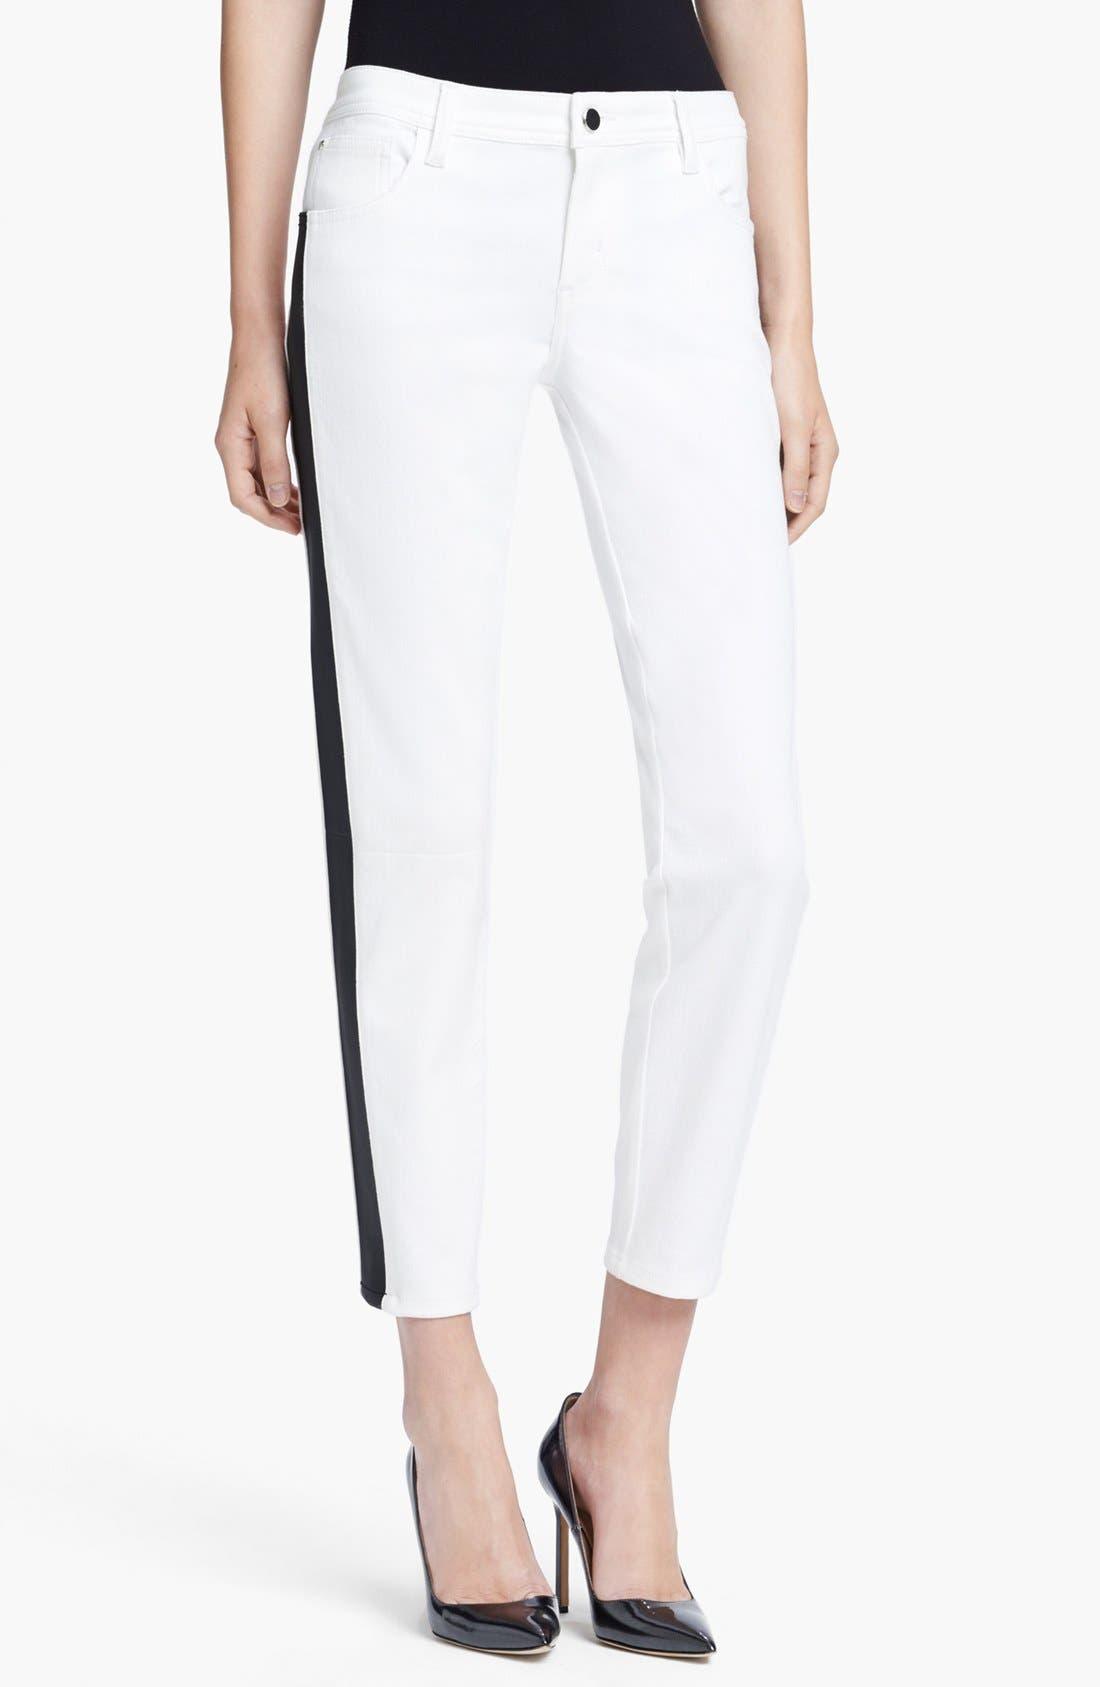 Main Image - Faith Connexion Tuxedo Stripe Ankle Jeans